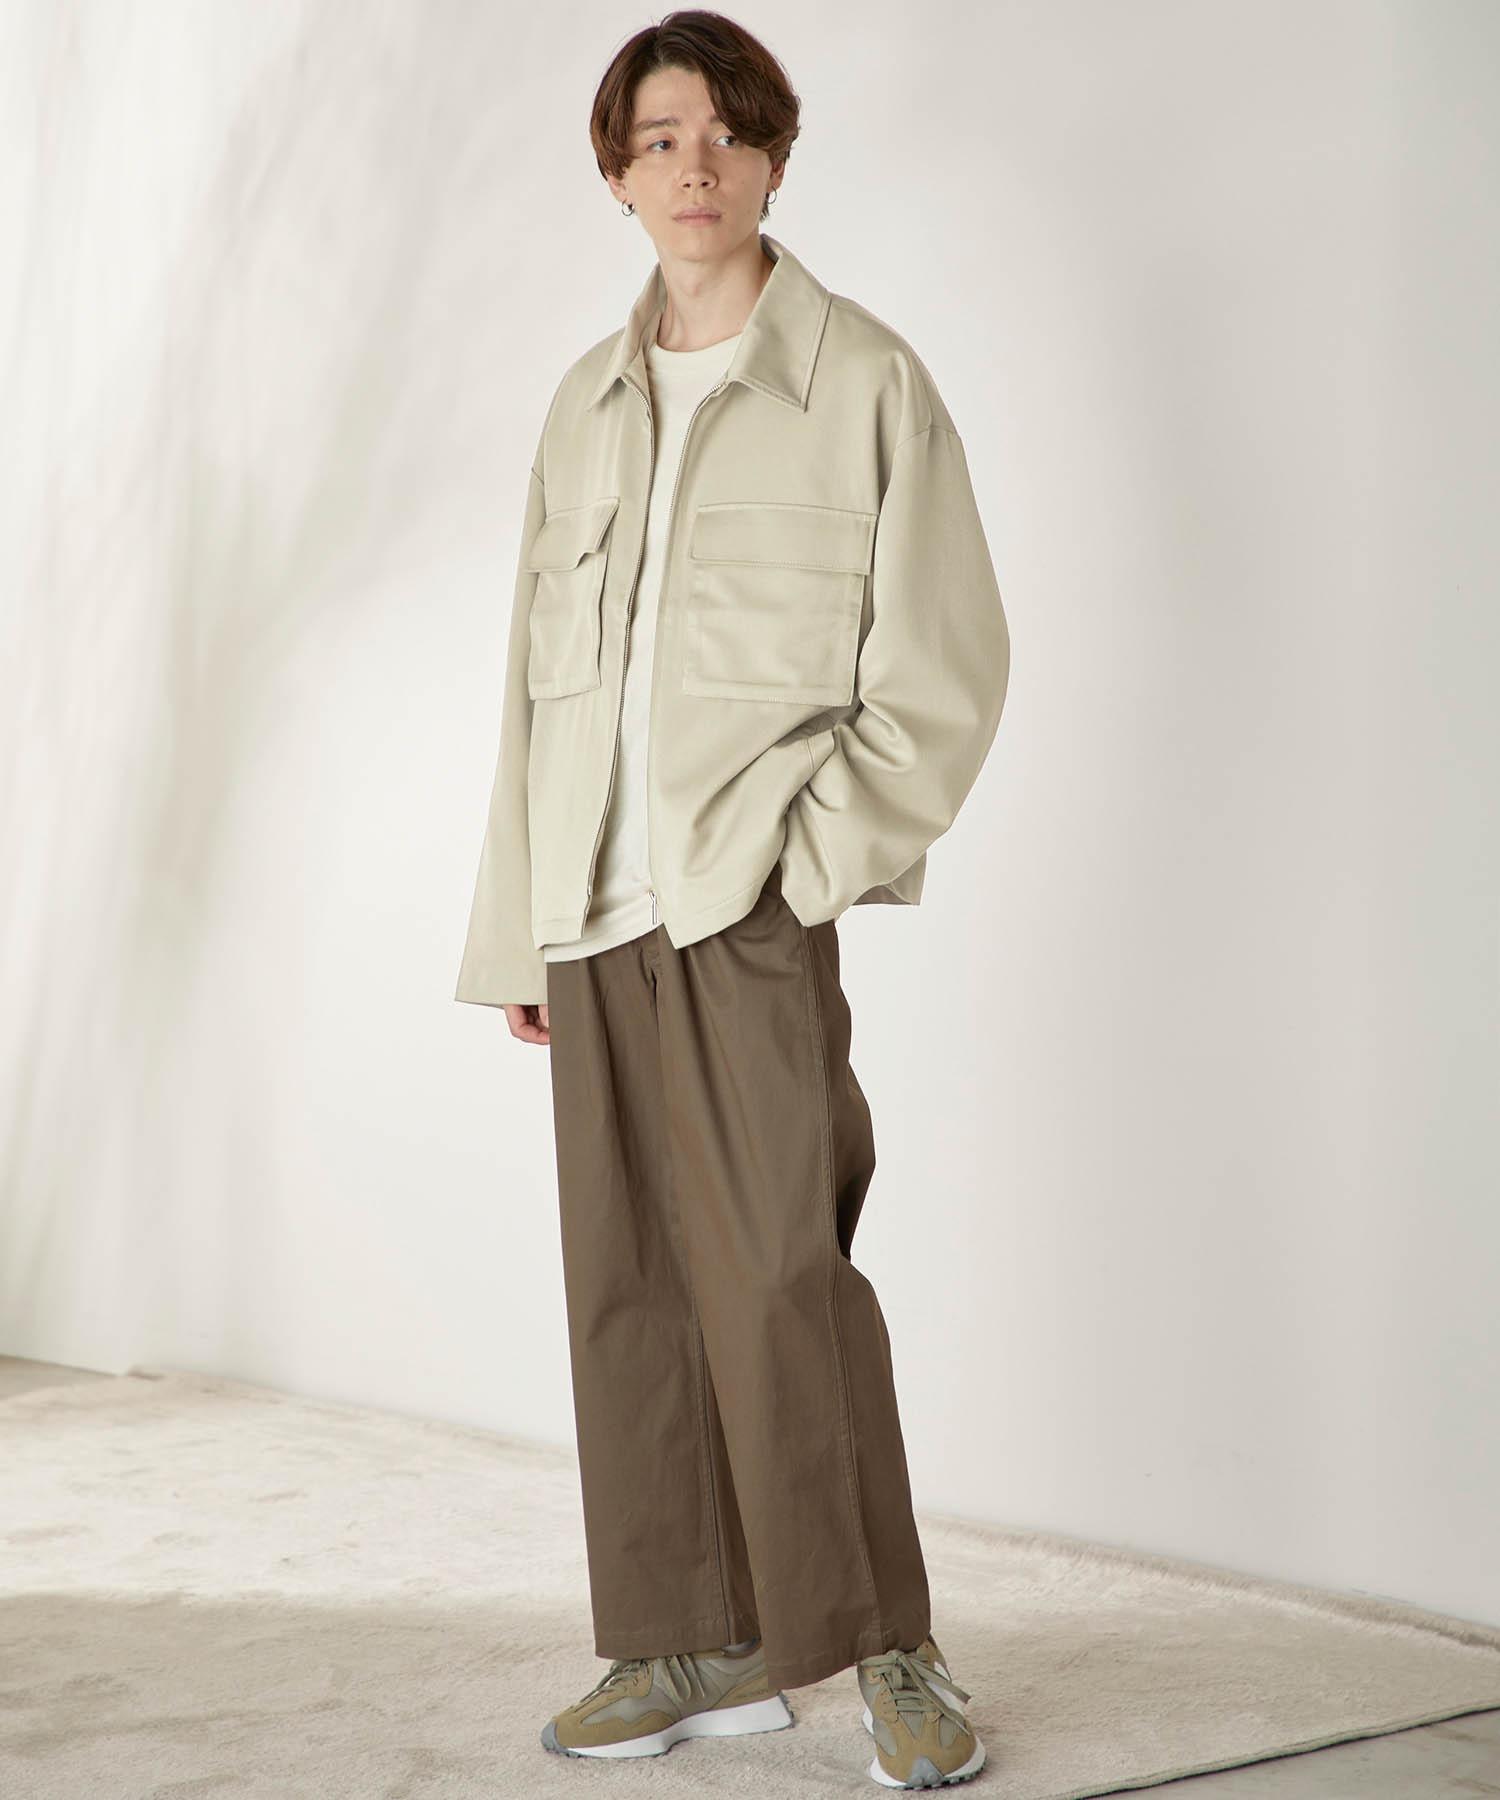 TRストレッチ スーツ地 オーバーサイズ CPOジャケット2021SPRING